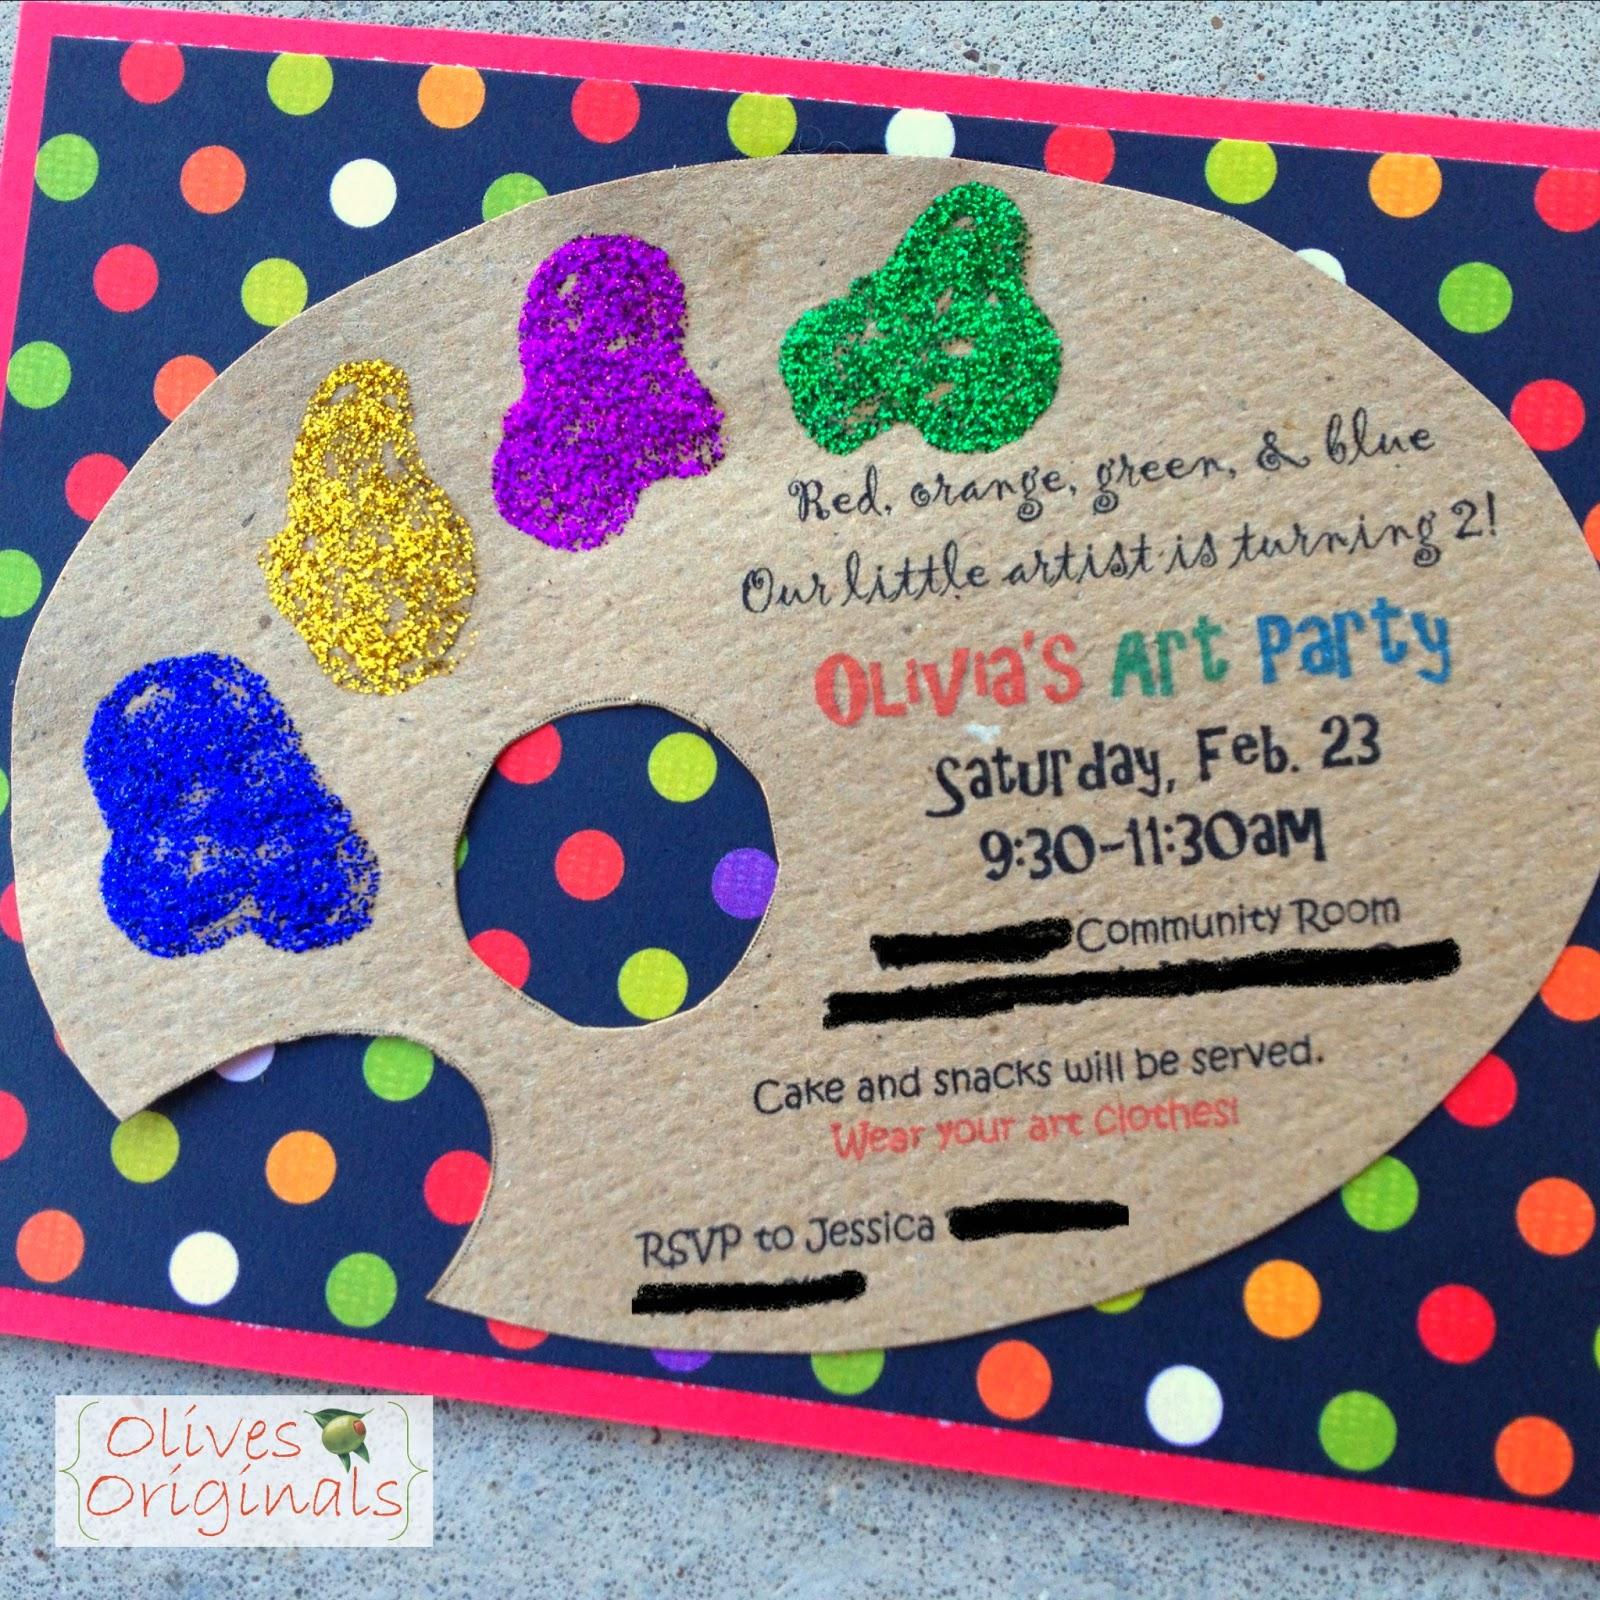 Olives Originals Art Party Invitations – Art Party Invites